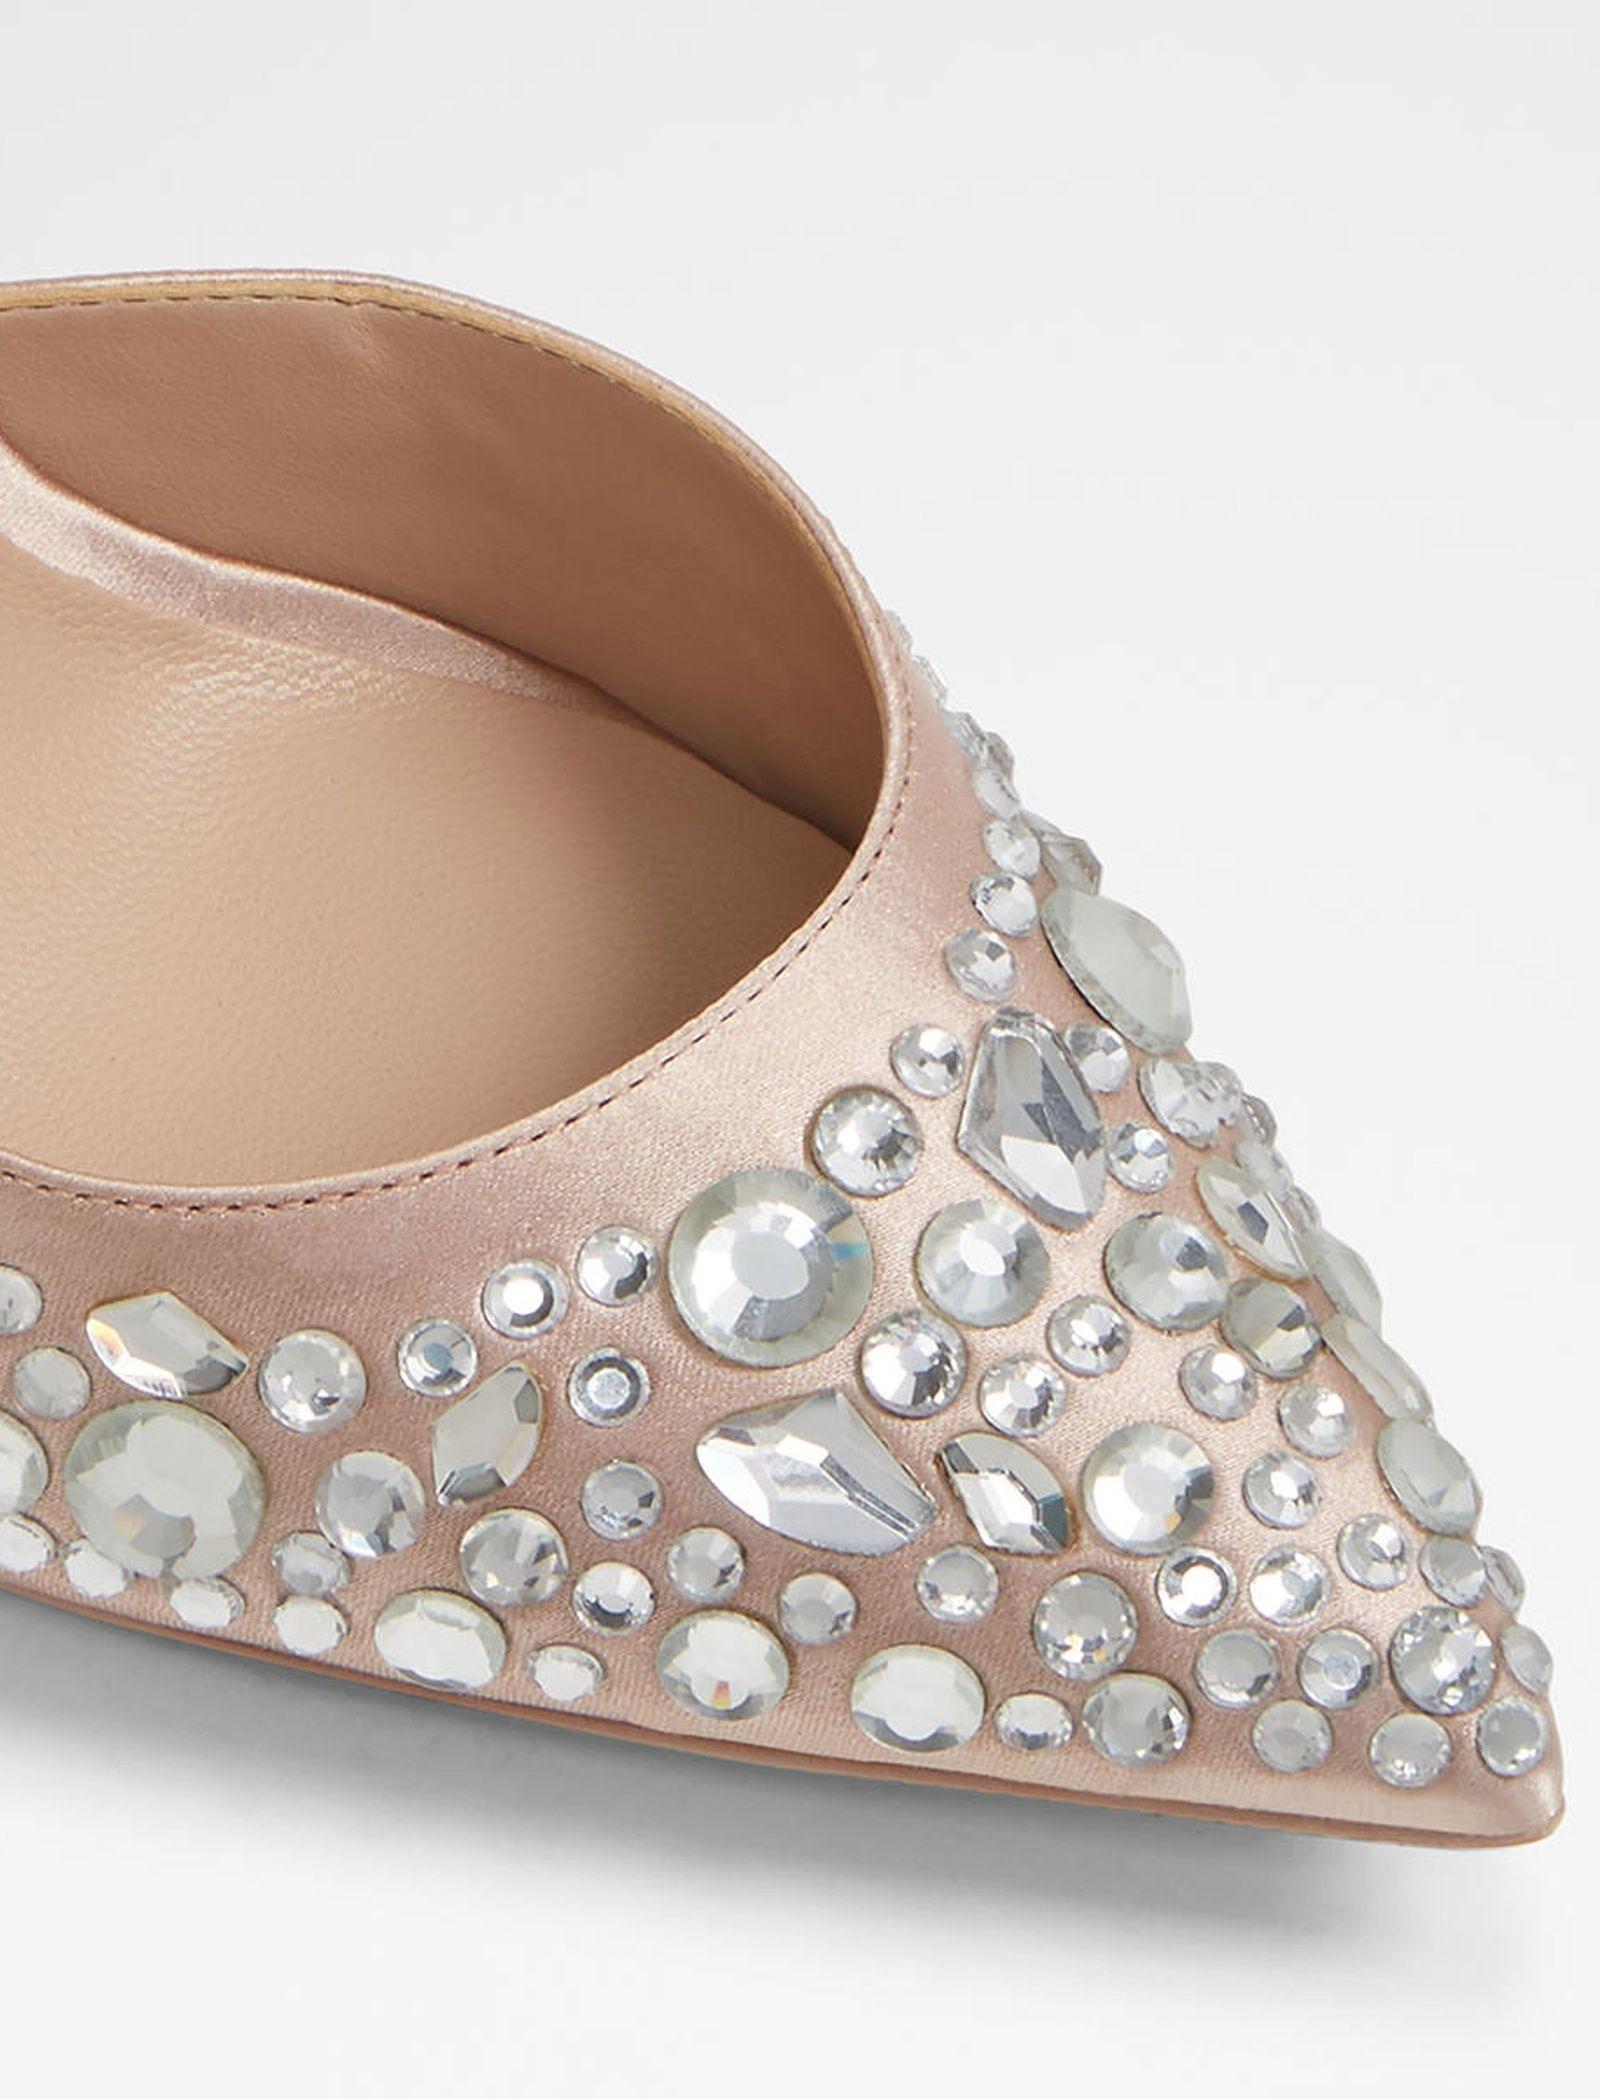 کفش پاشنه بلند پارچه ای زنانه - آلدو - صورتي روشن - 6